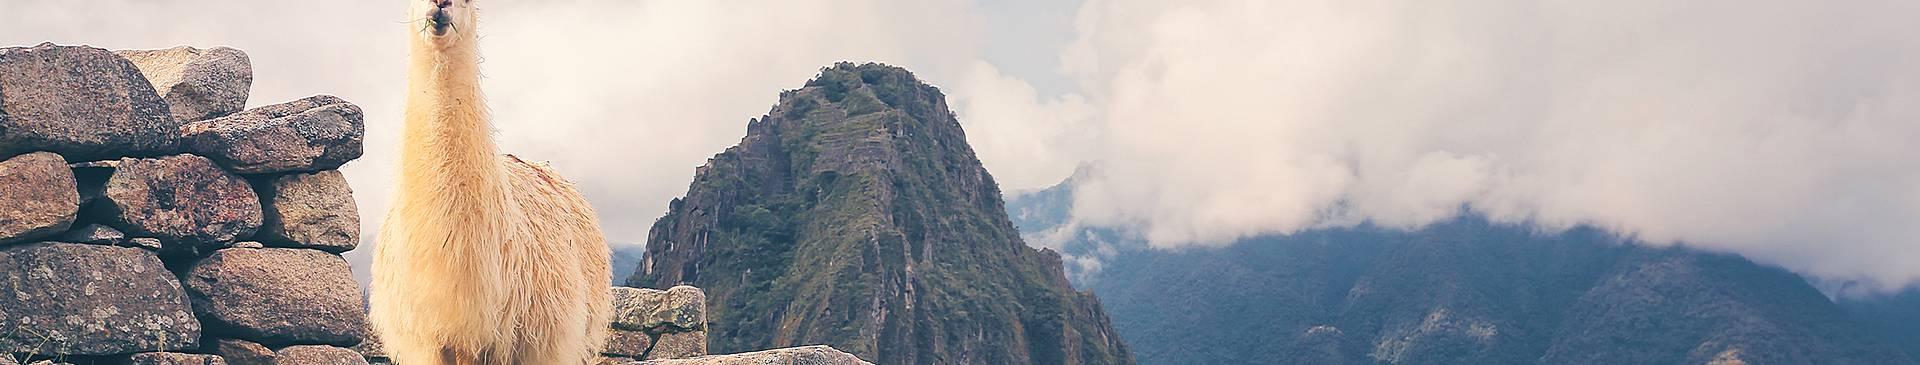 Voyage au Pérou en août